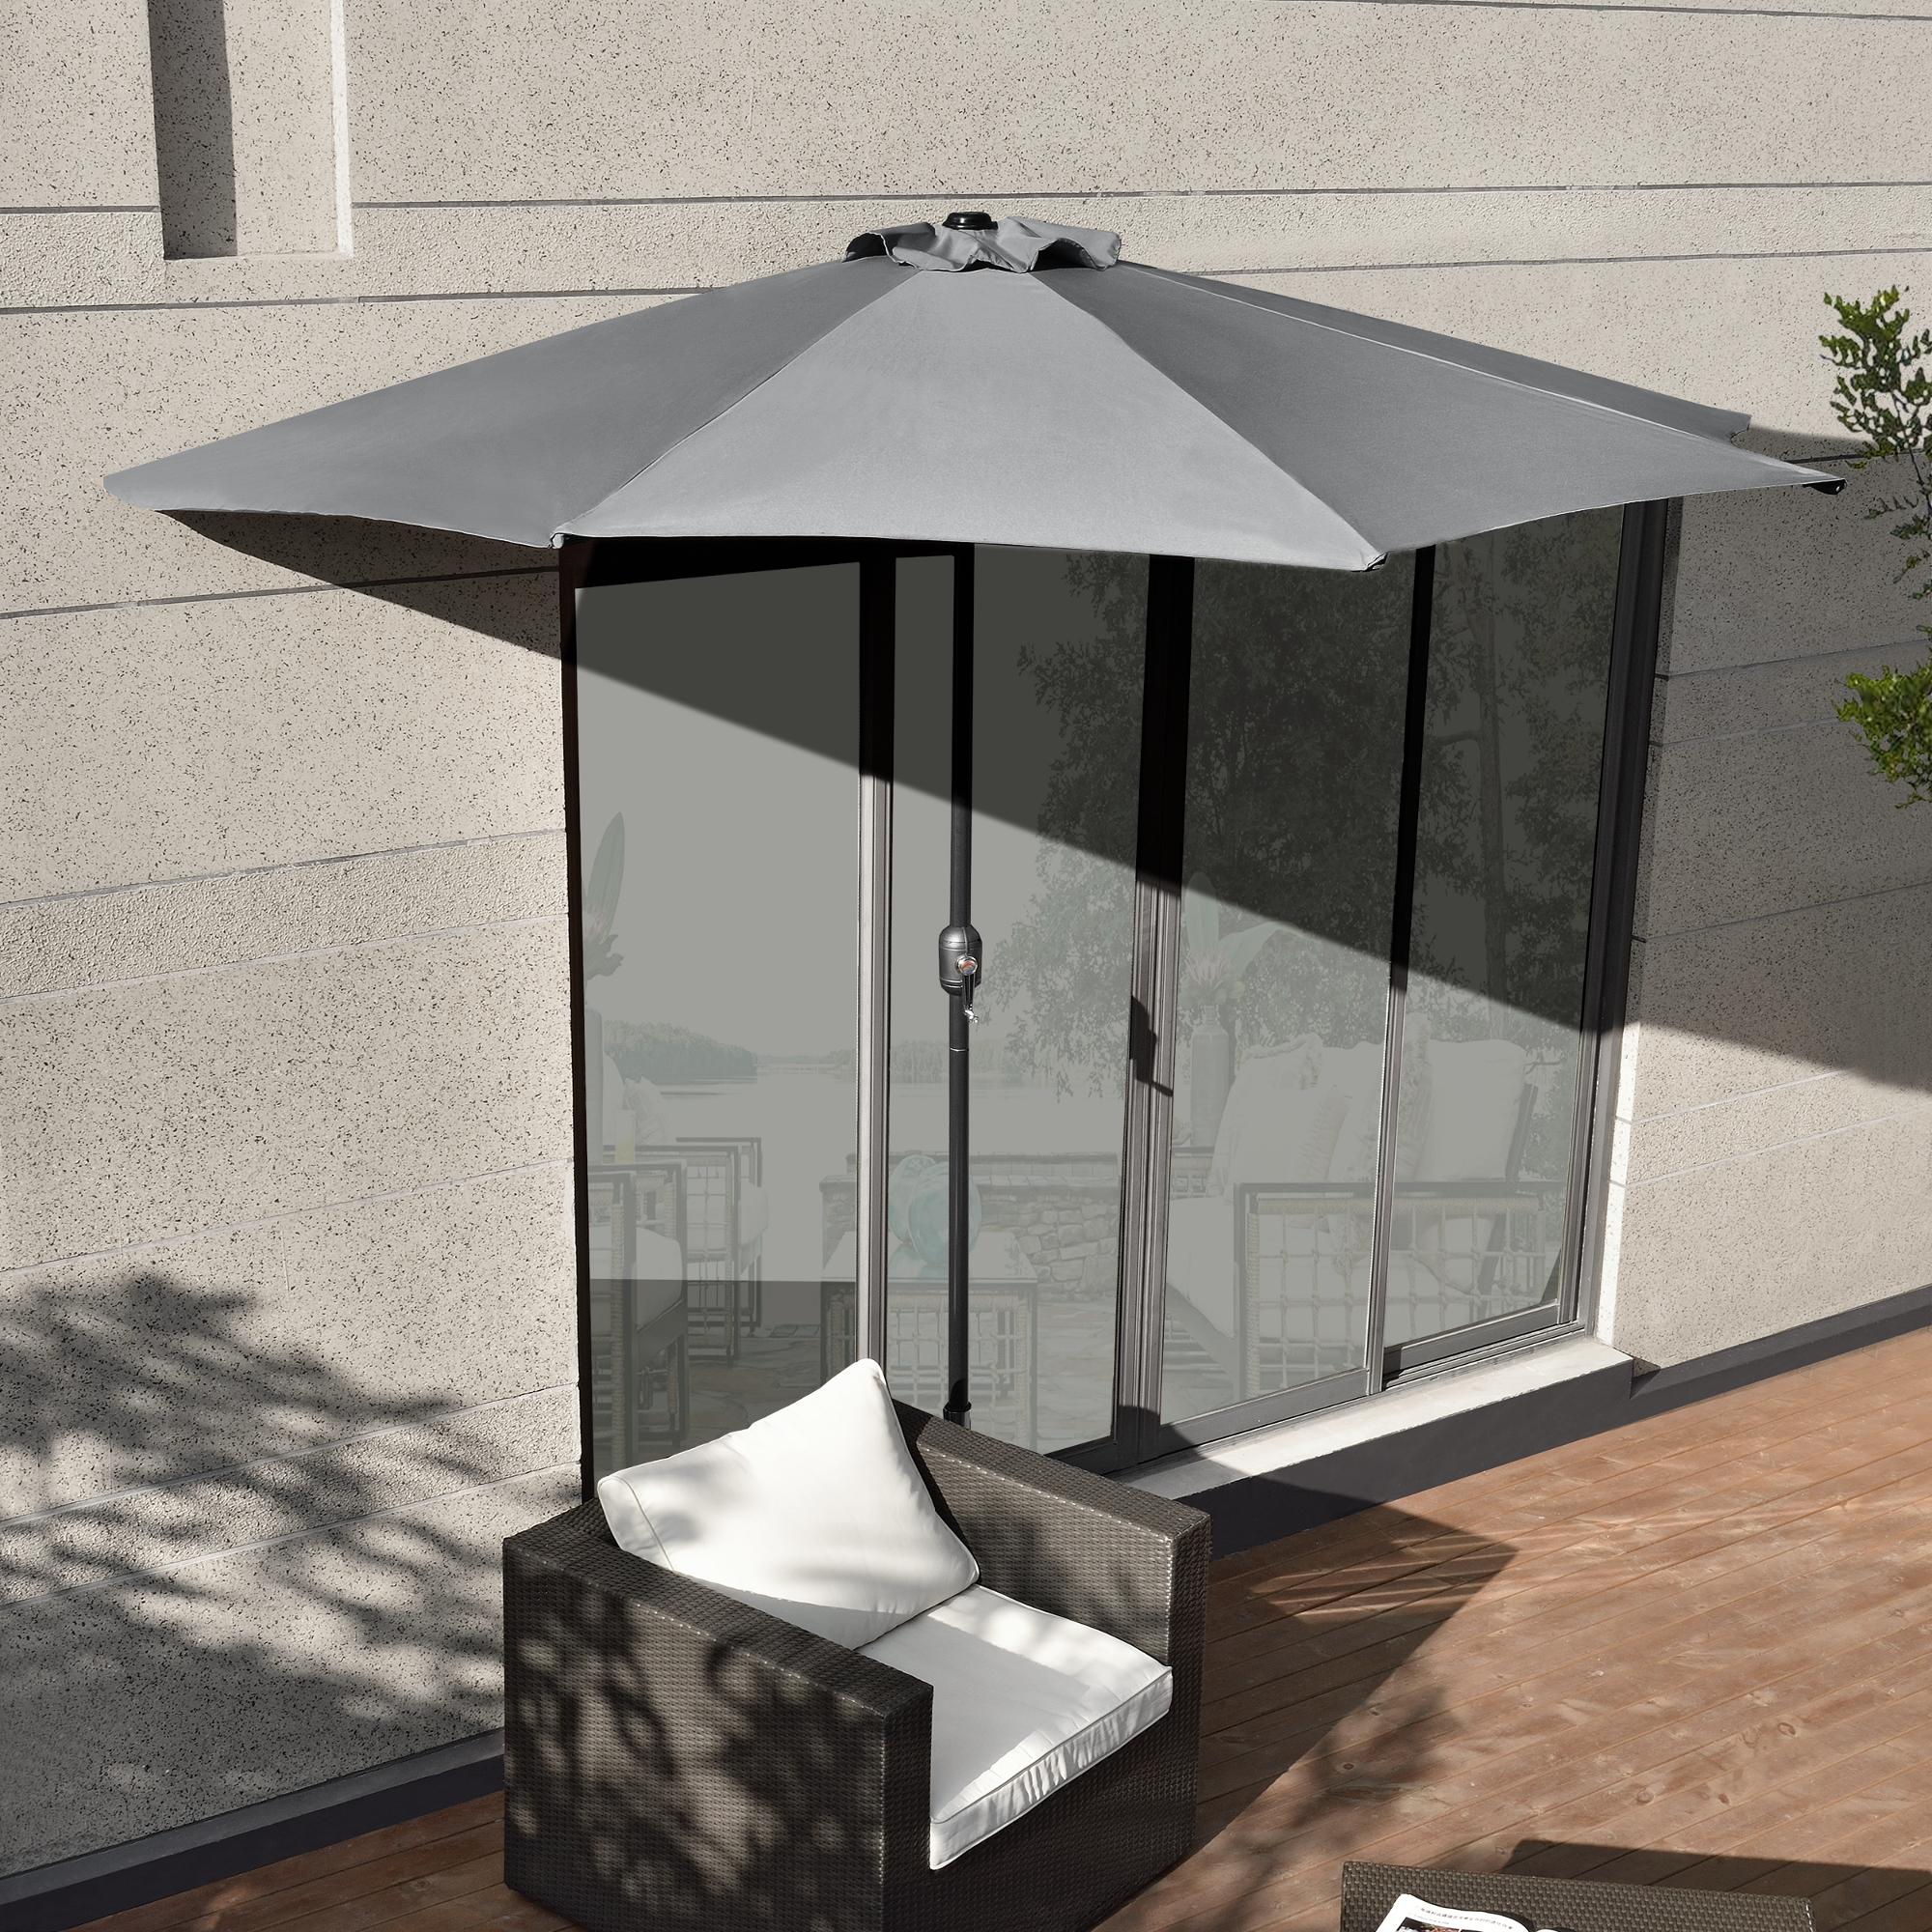 umbrela terasa preturi rezultate umbrela terasa lista produse preturi. Black Bedroom Furniture Sets. Home Design Ideas